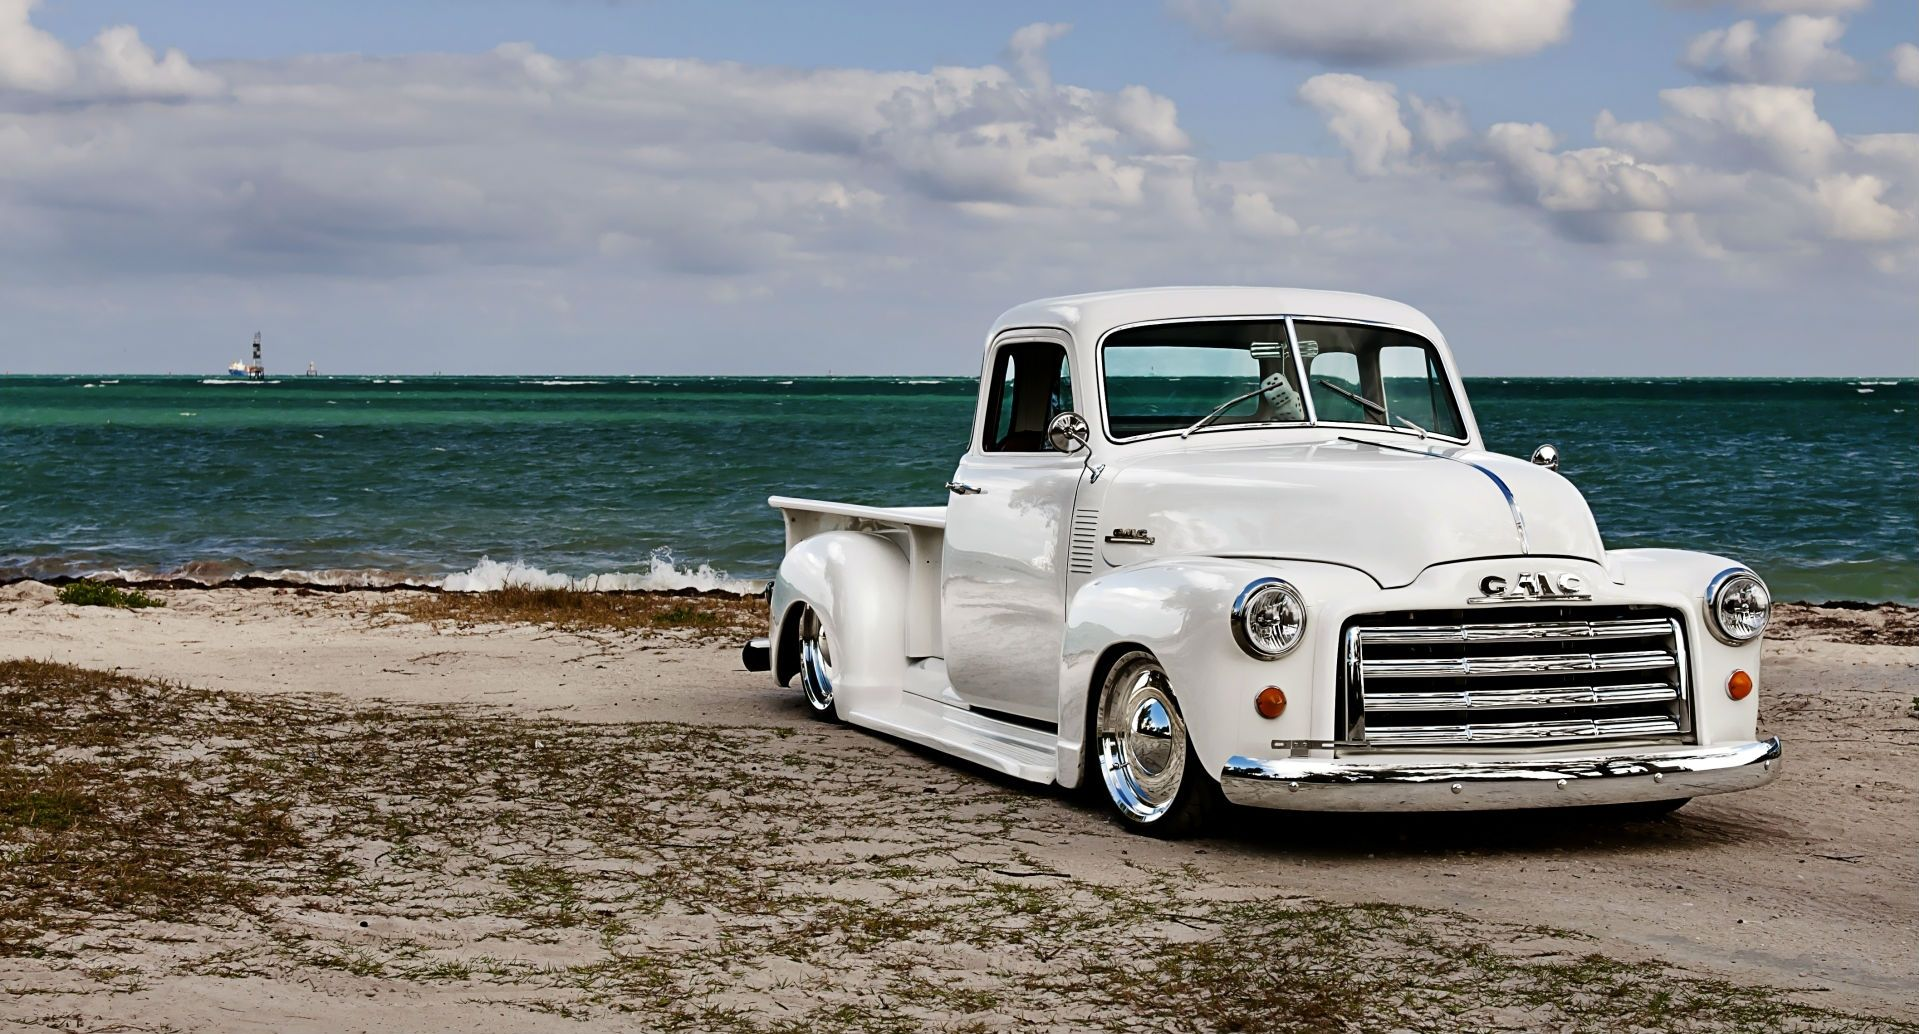 Pin By Theoxaris On Slammed Chevy Trucks Old Pickup Trucks 54 Chevy Truck Classic Trucks